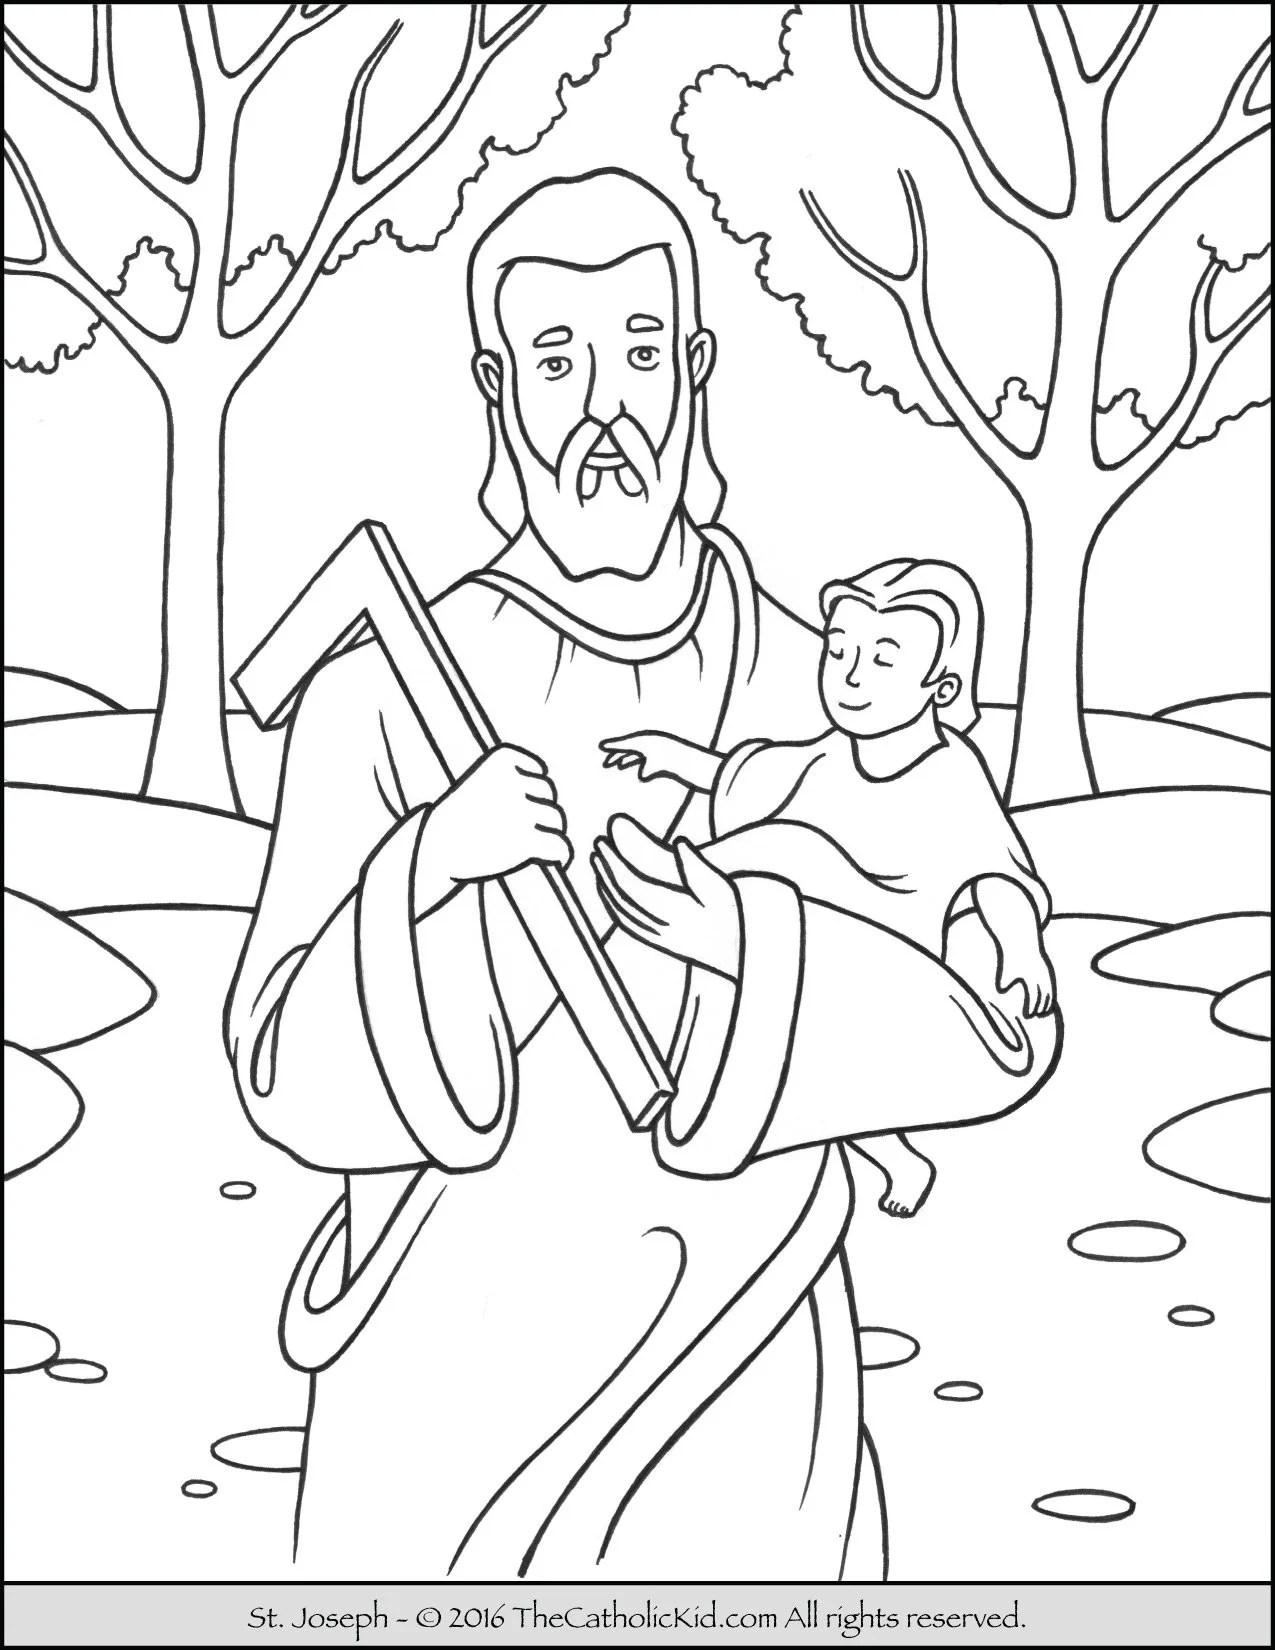 Saint Joseph Coloring Page The Catholic Kid